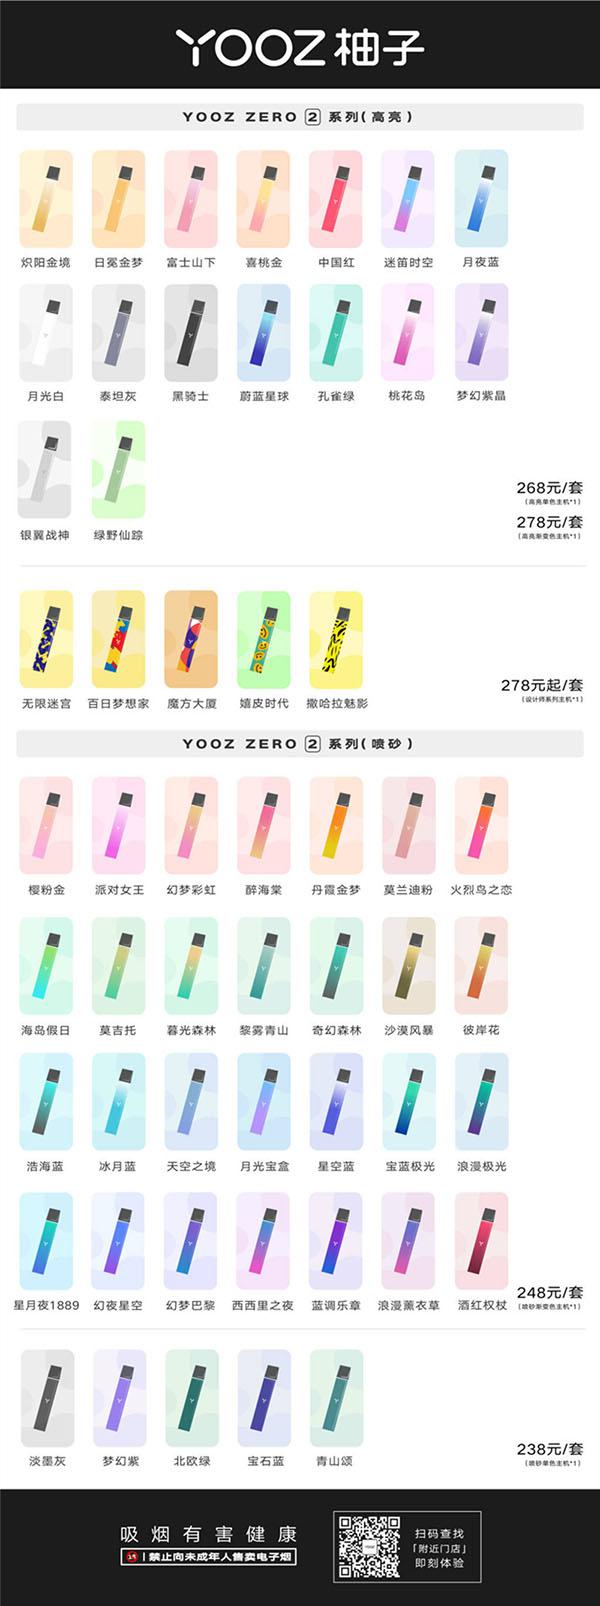 yooz柚子电子雾化器官方售价